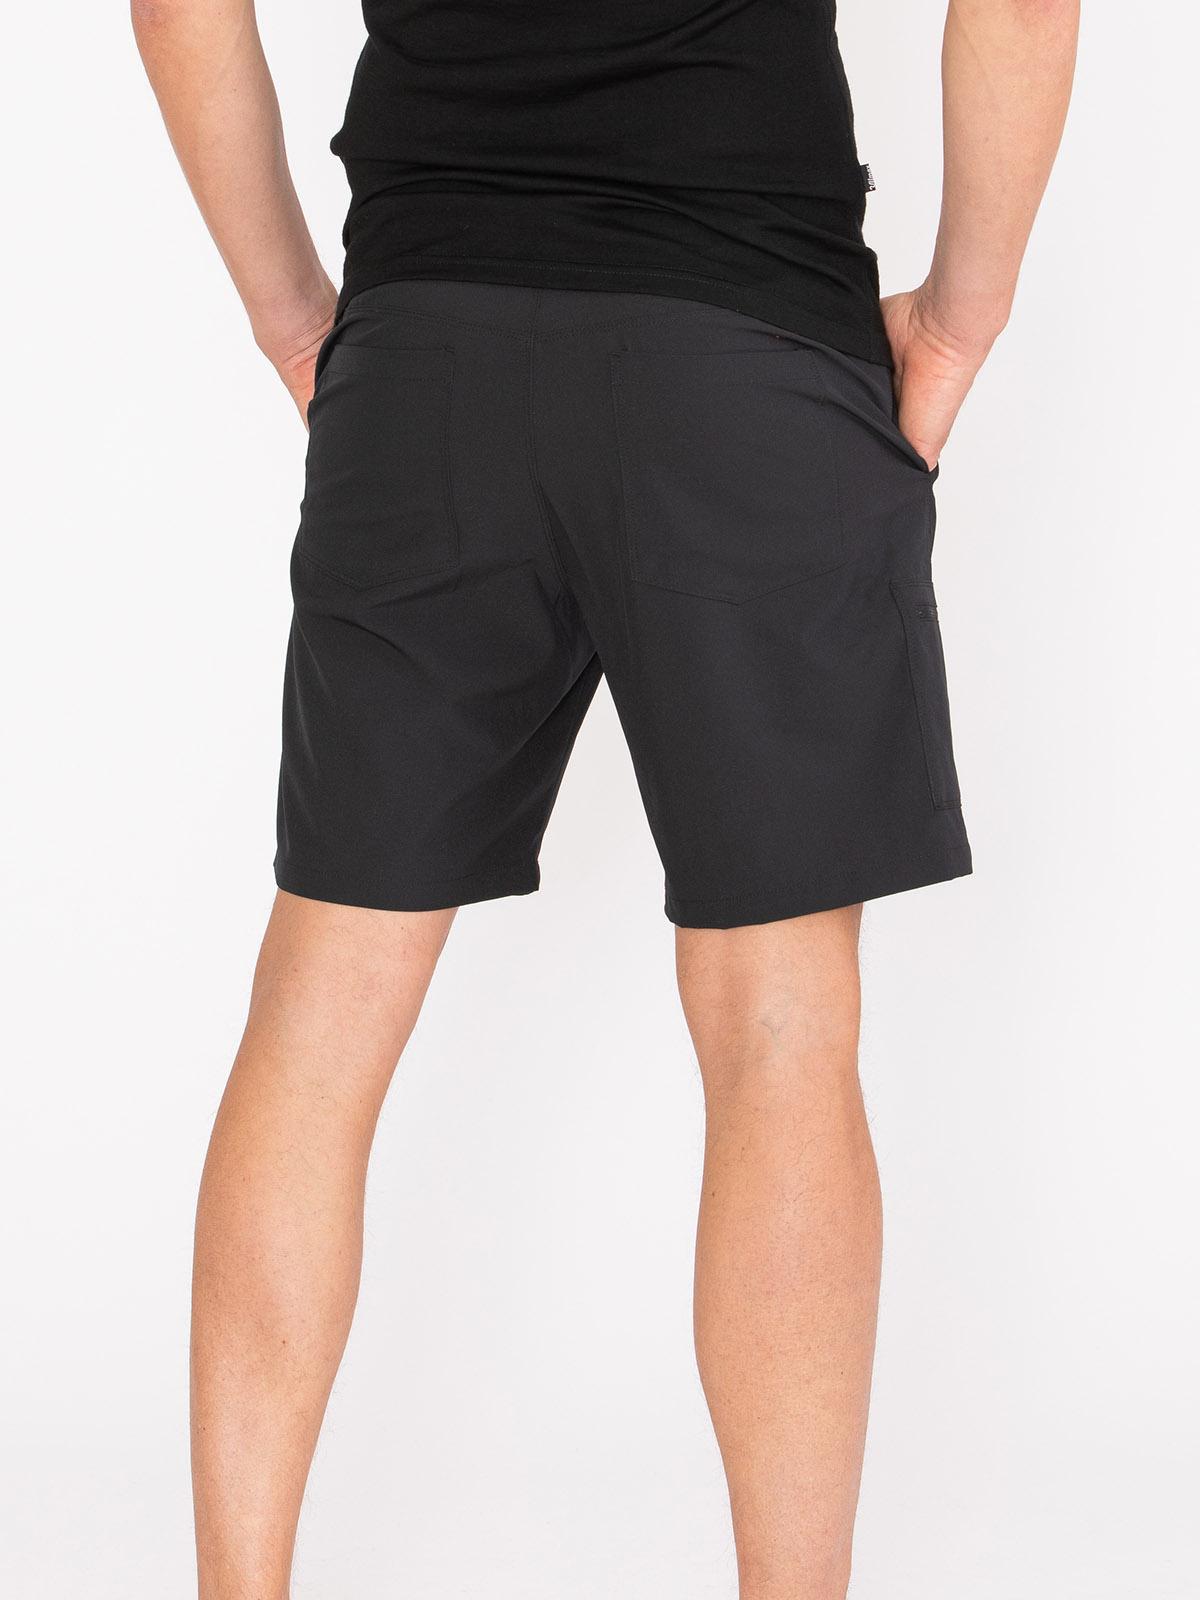 Shorts Men Svart